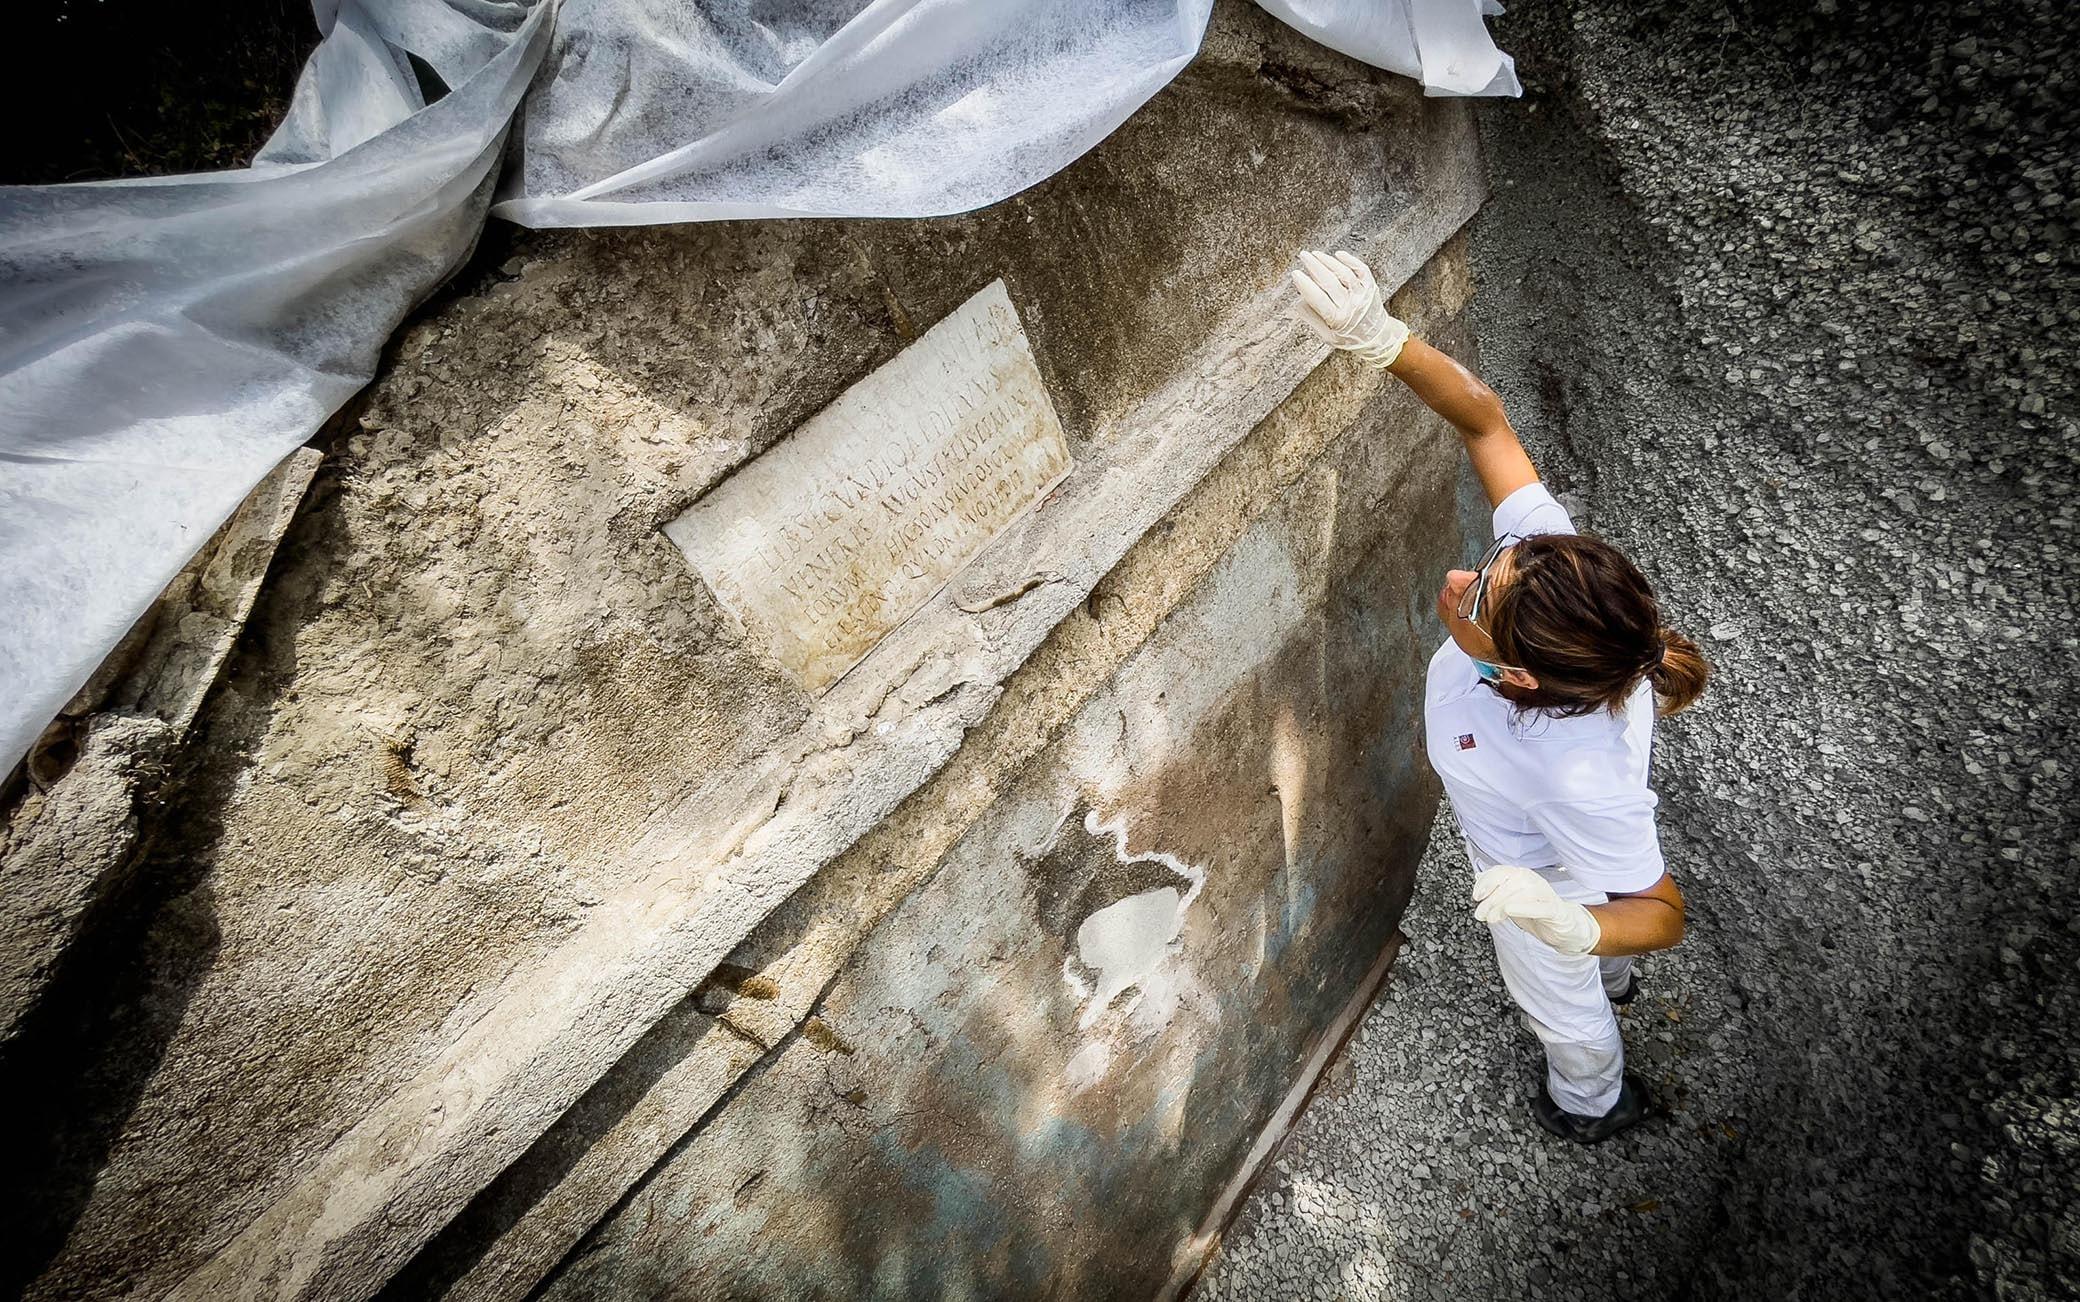 La tomba scoperta a Pompei